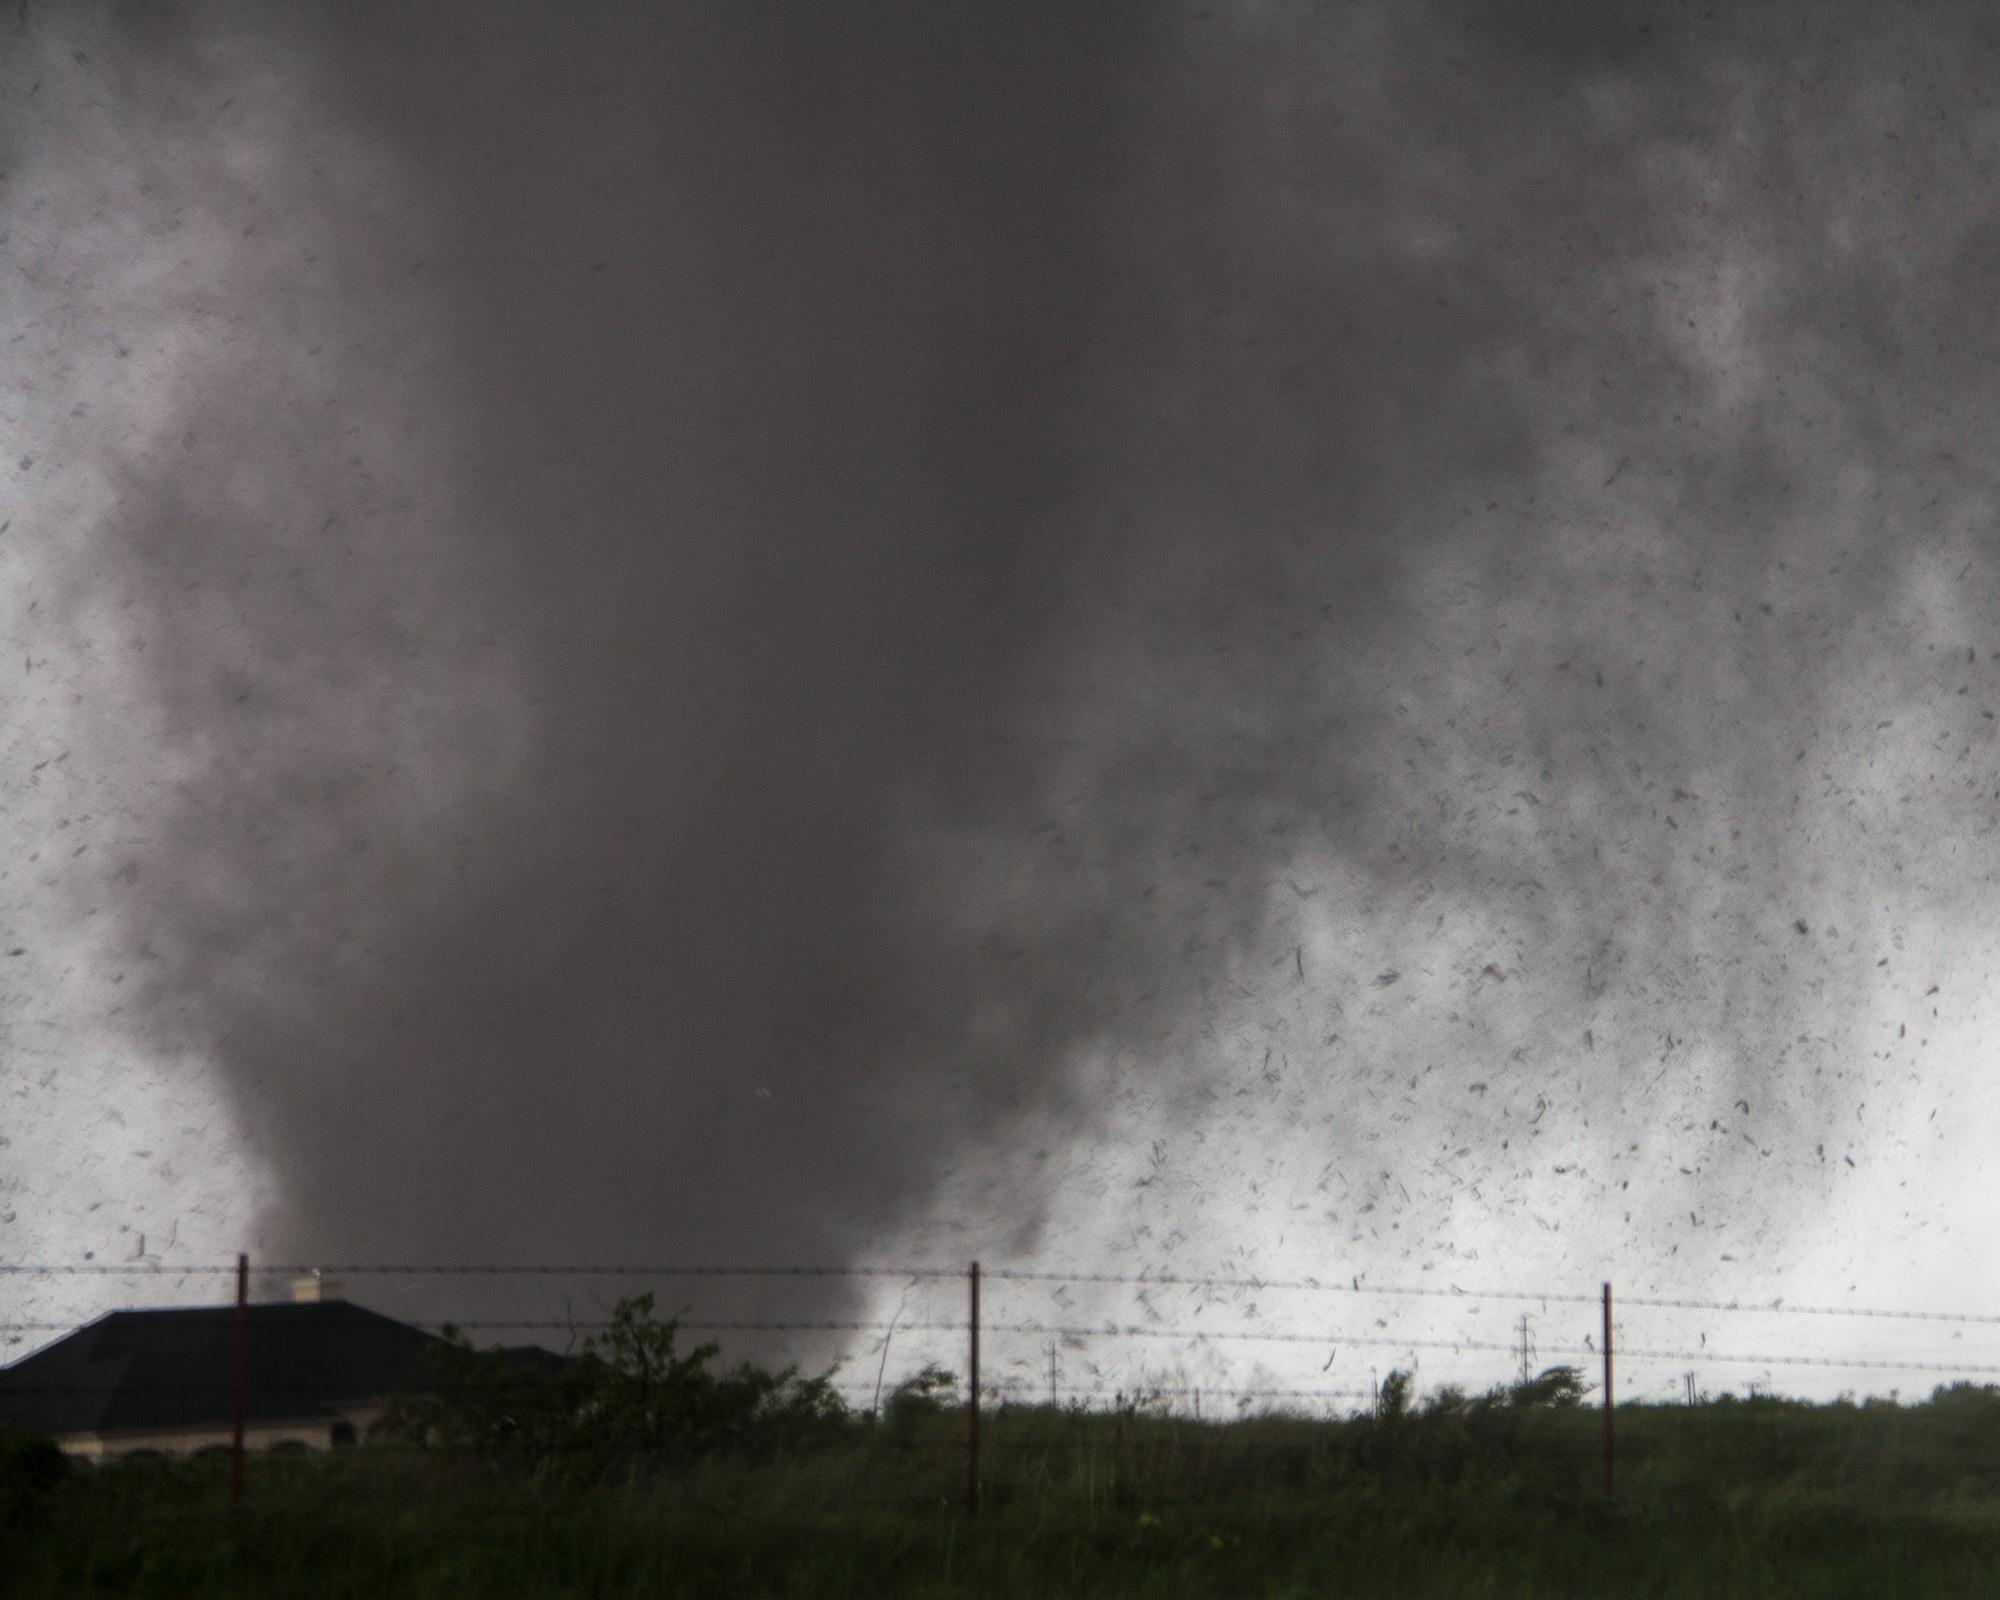 The EF-5 Moore Oklahoma Tornado approaches Sooner Road